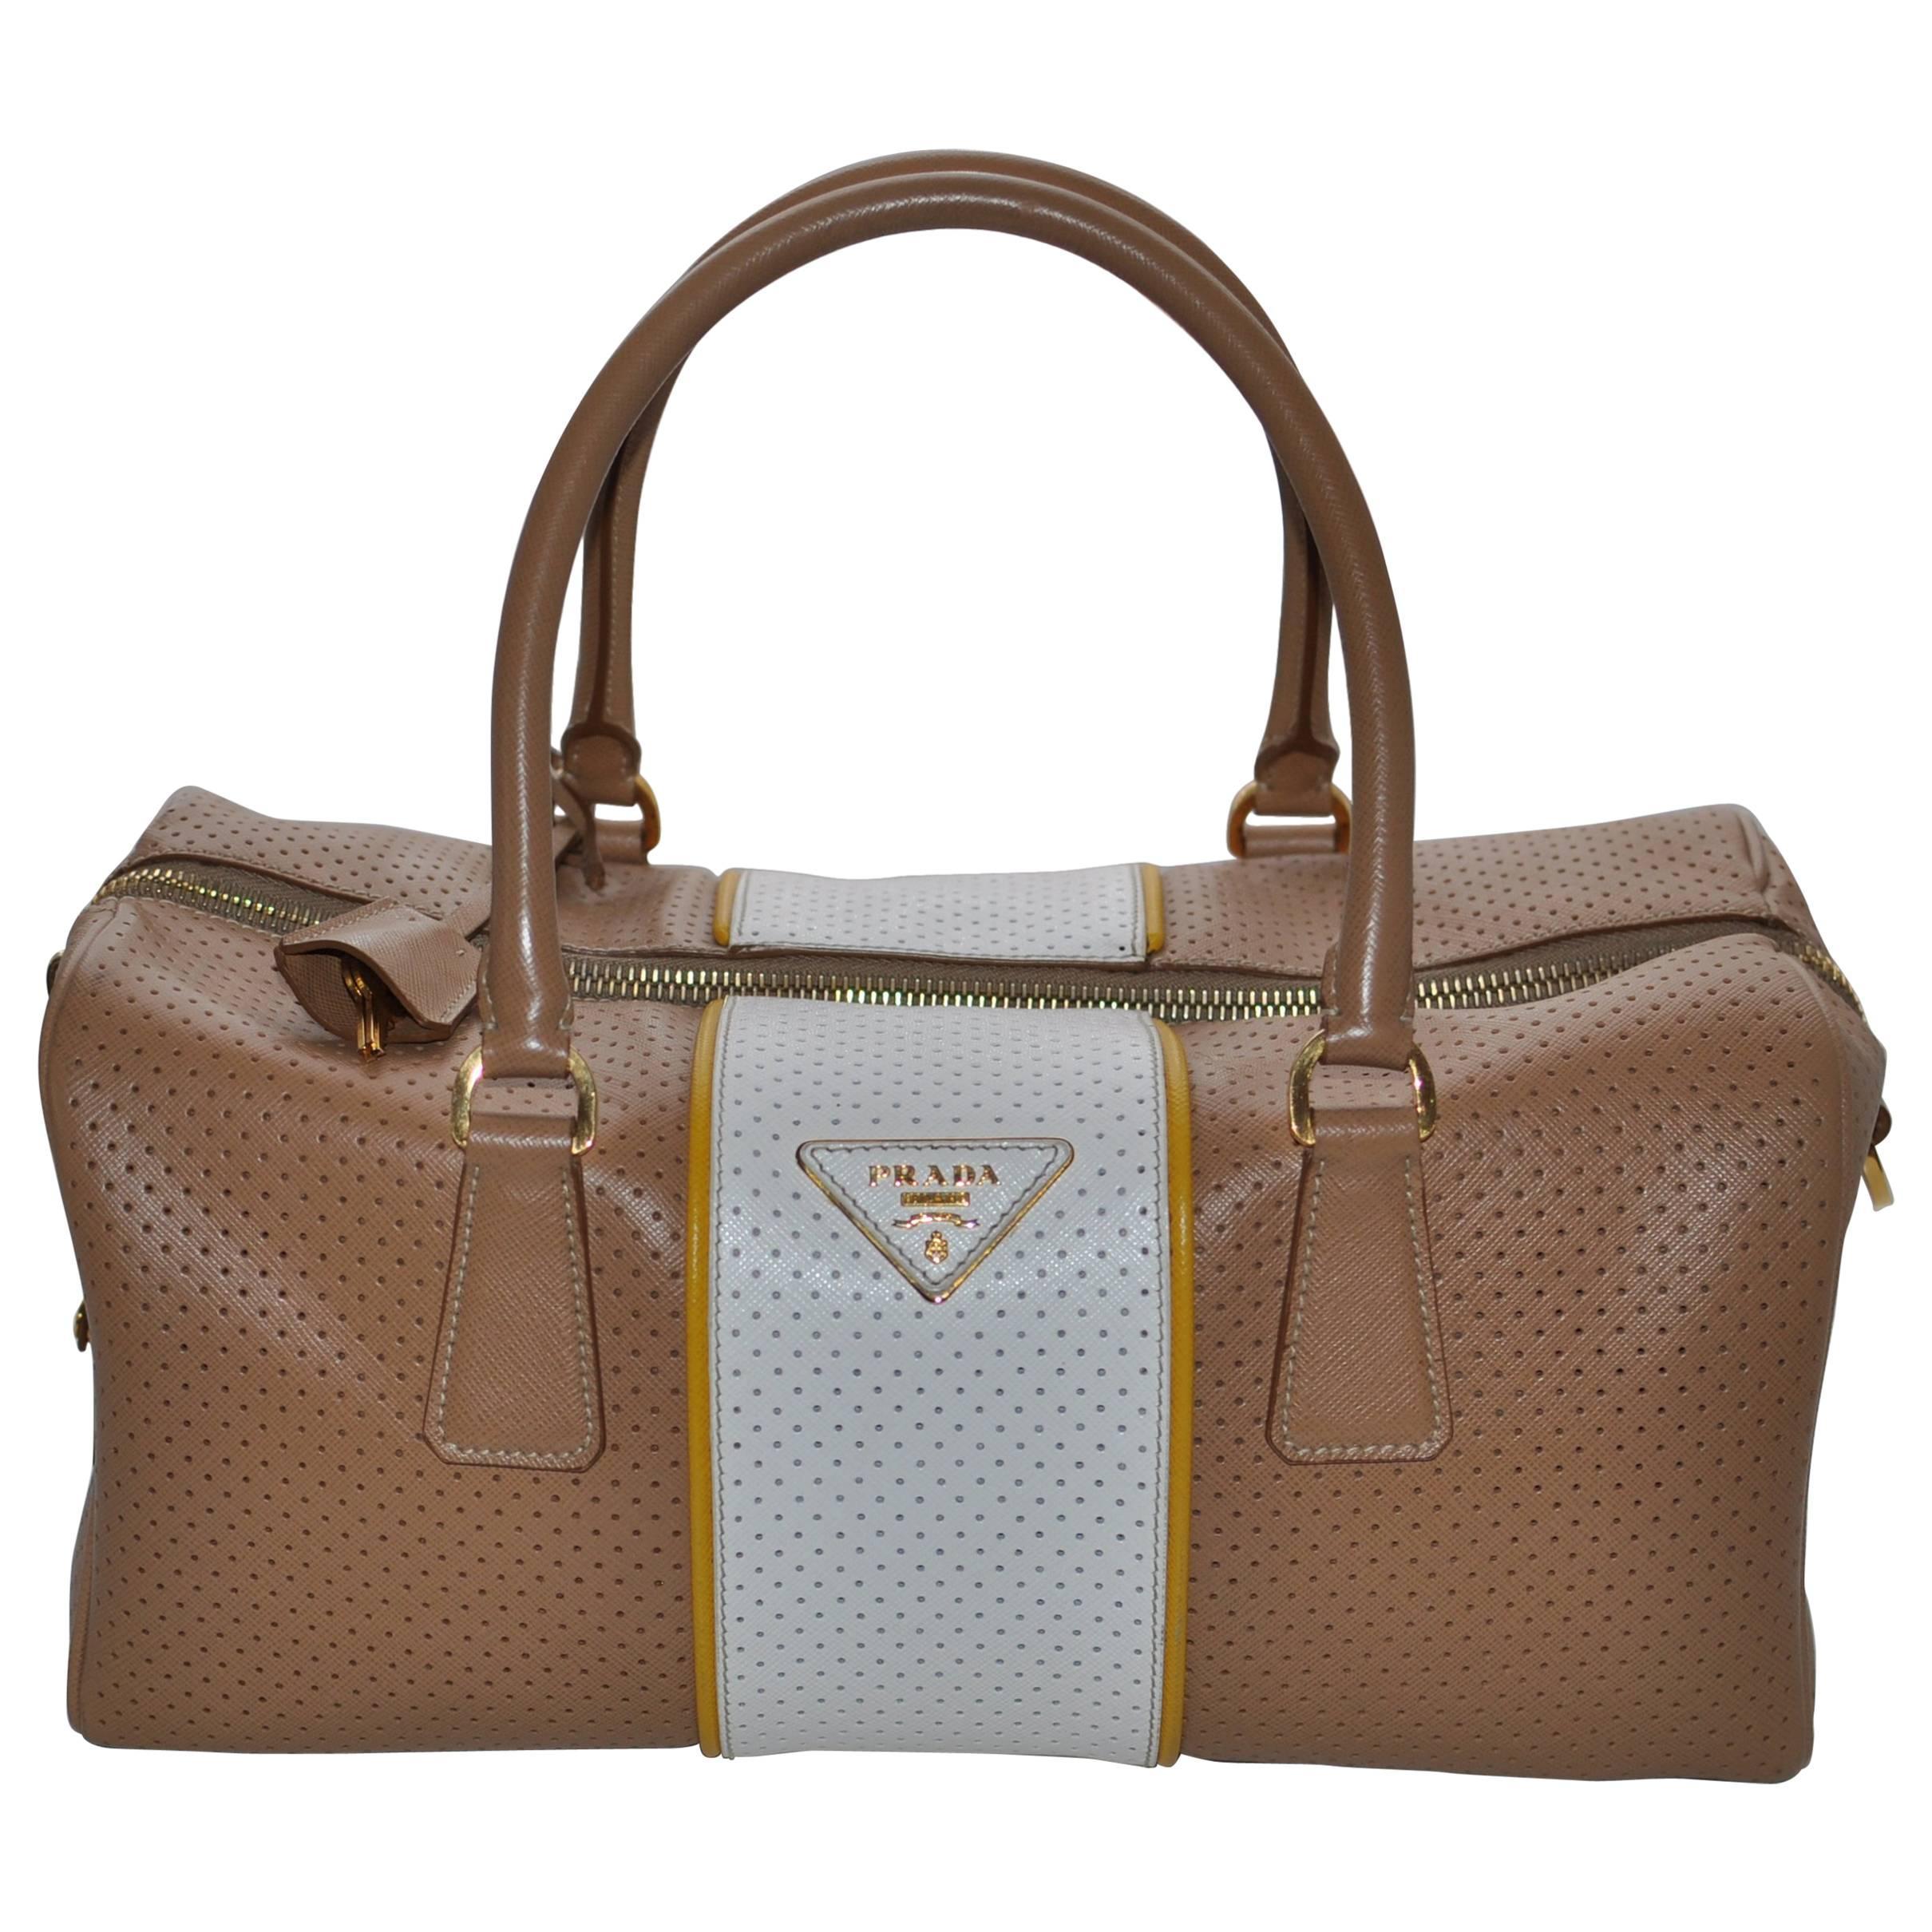 1stdibs Prada Perforated Leather Cuoio/mimosa Safiano Handbag A1BsaH